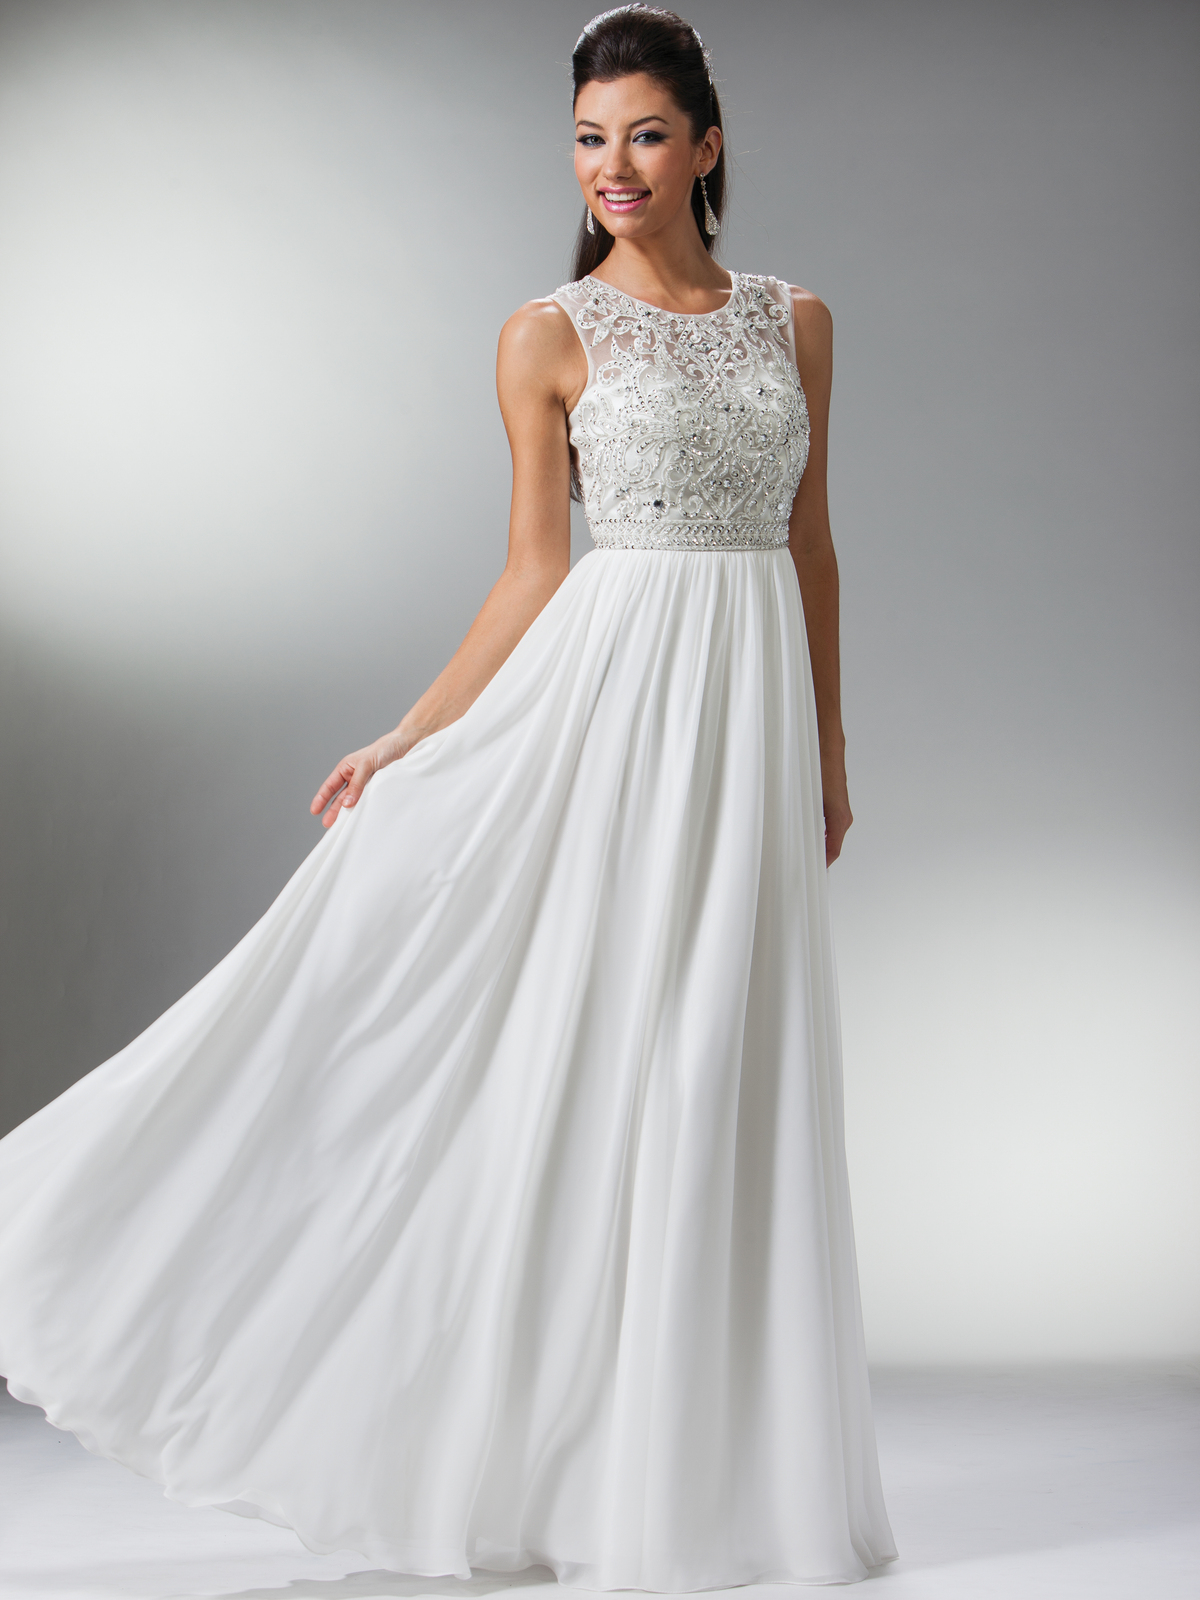 white long evening dresses photo - 1